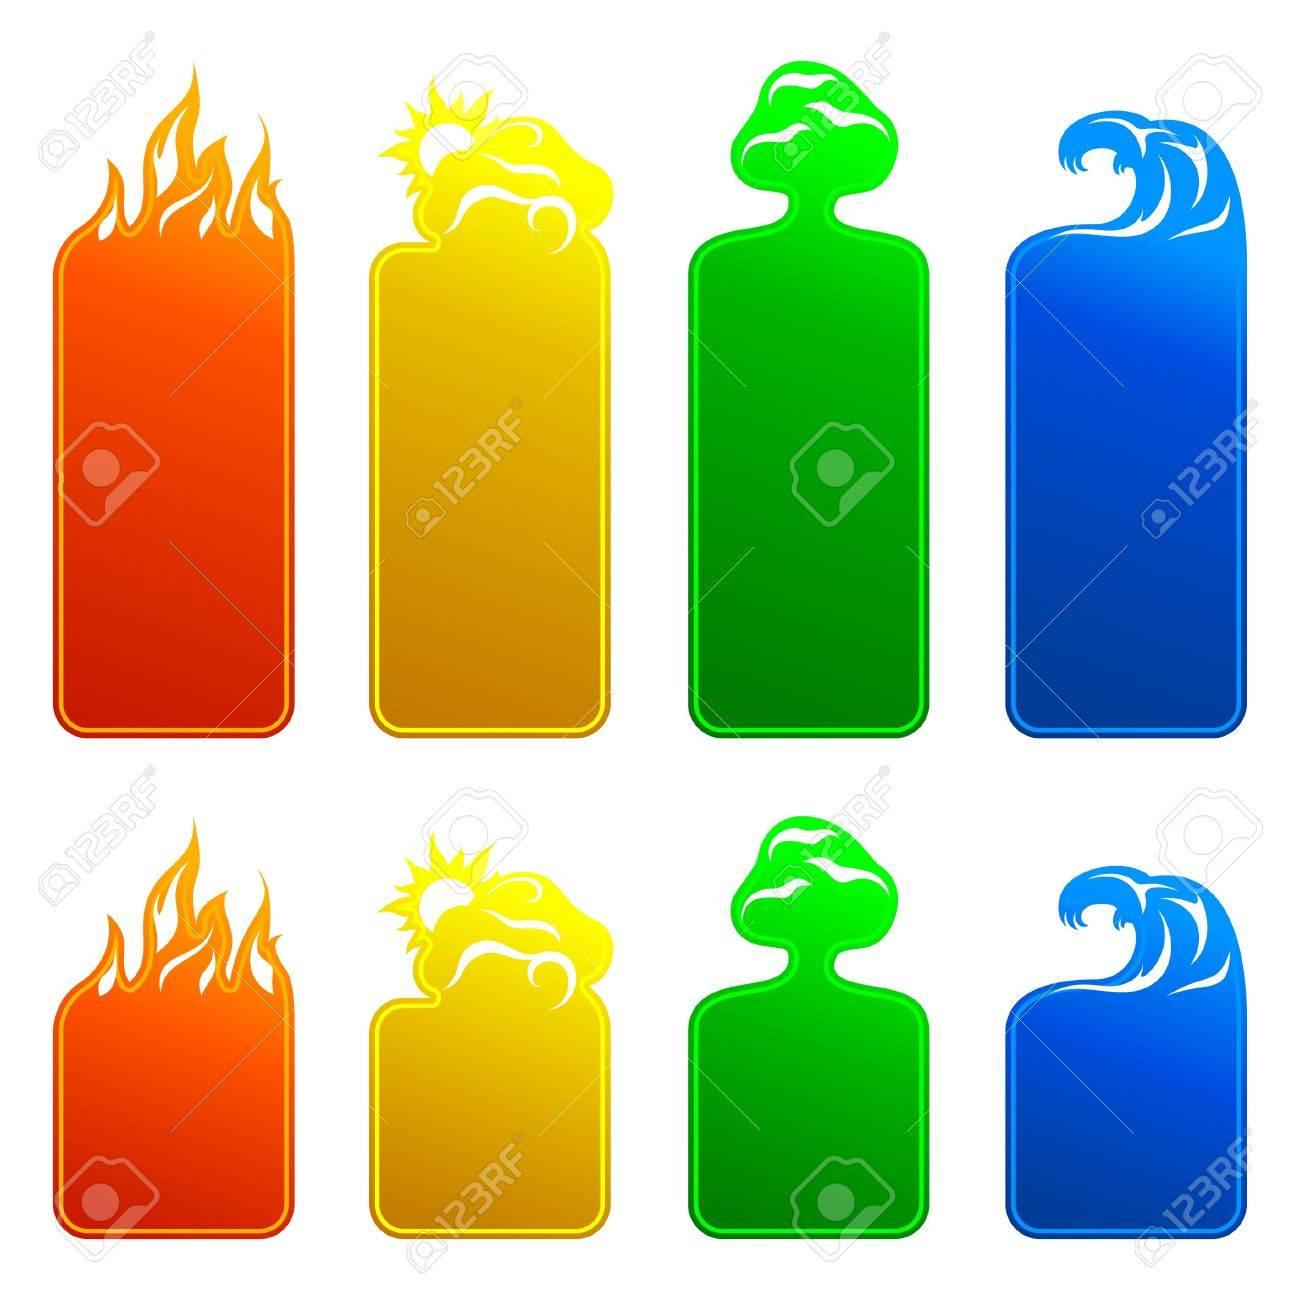 Banners 4 elements Stock Vector - 11218102